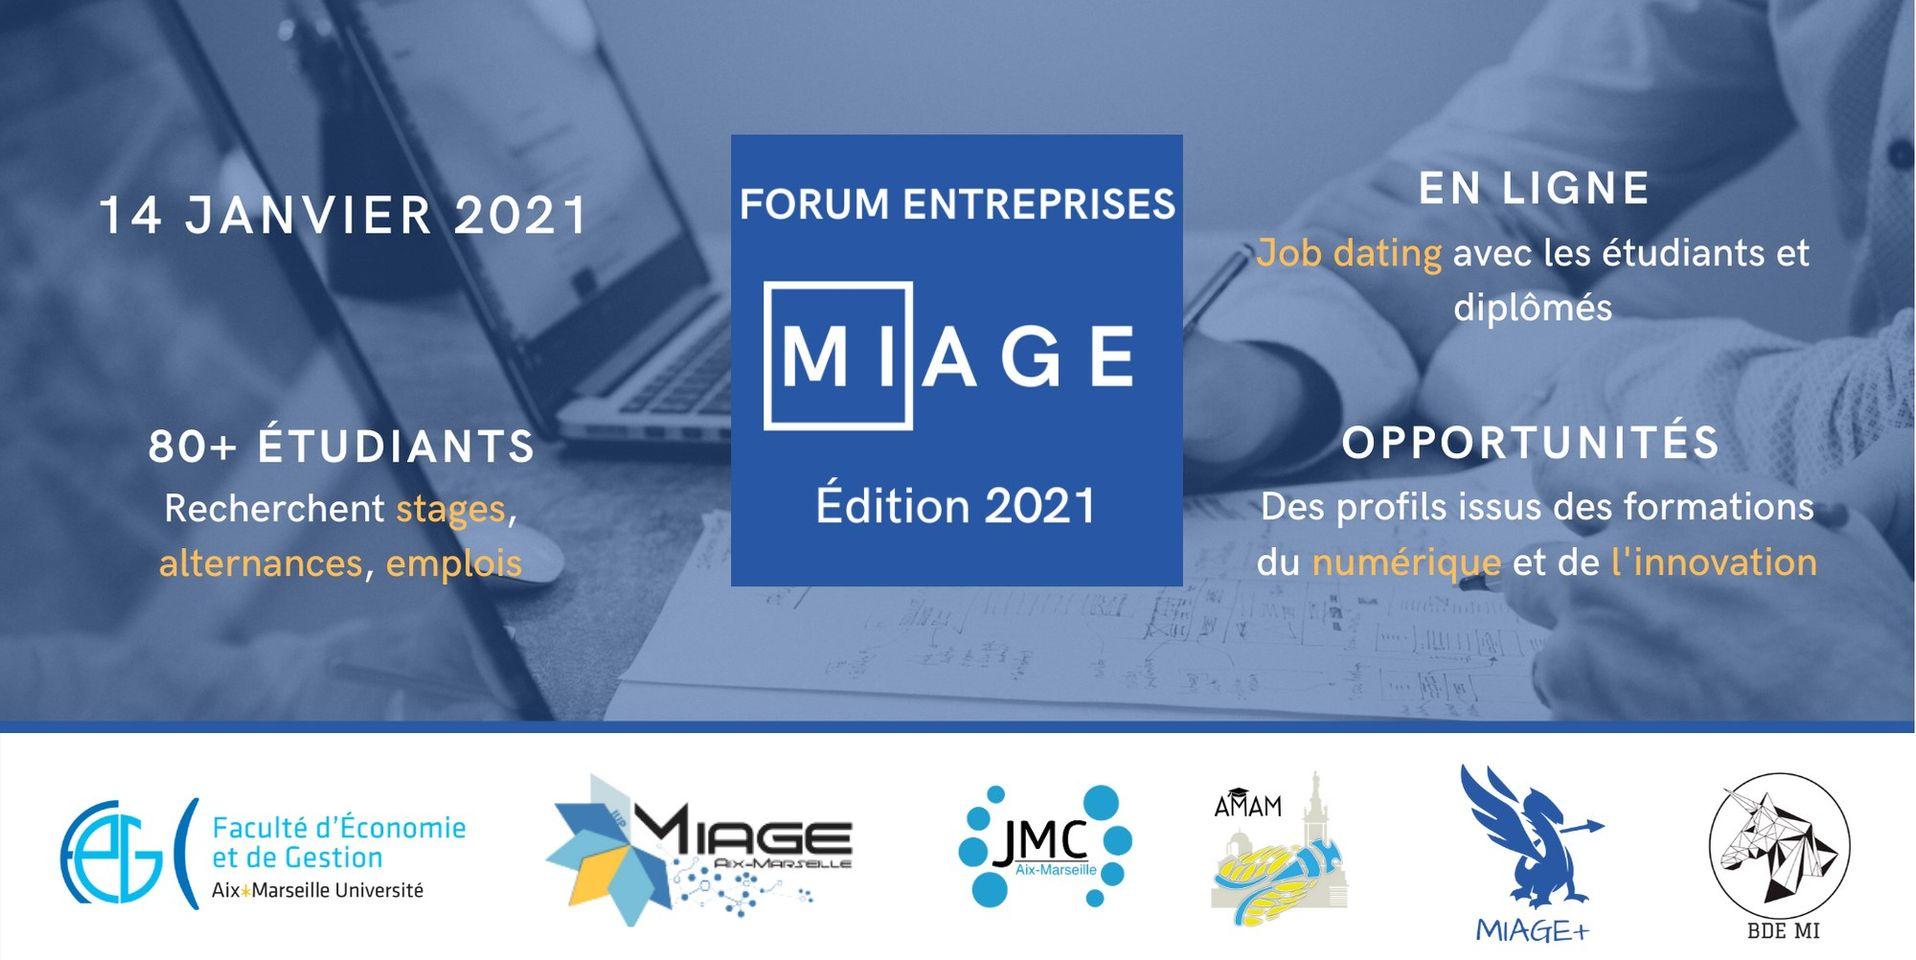 Forum Entreprises MIAGE